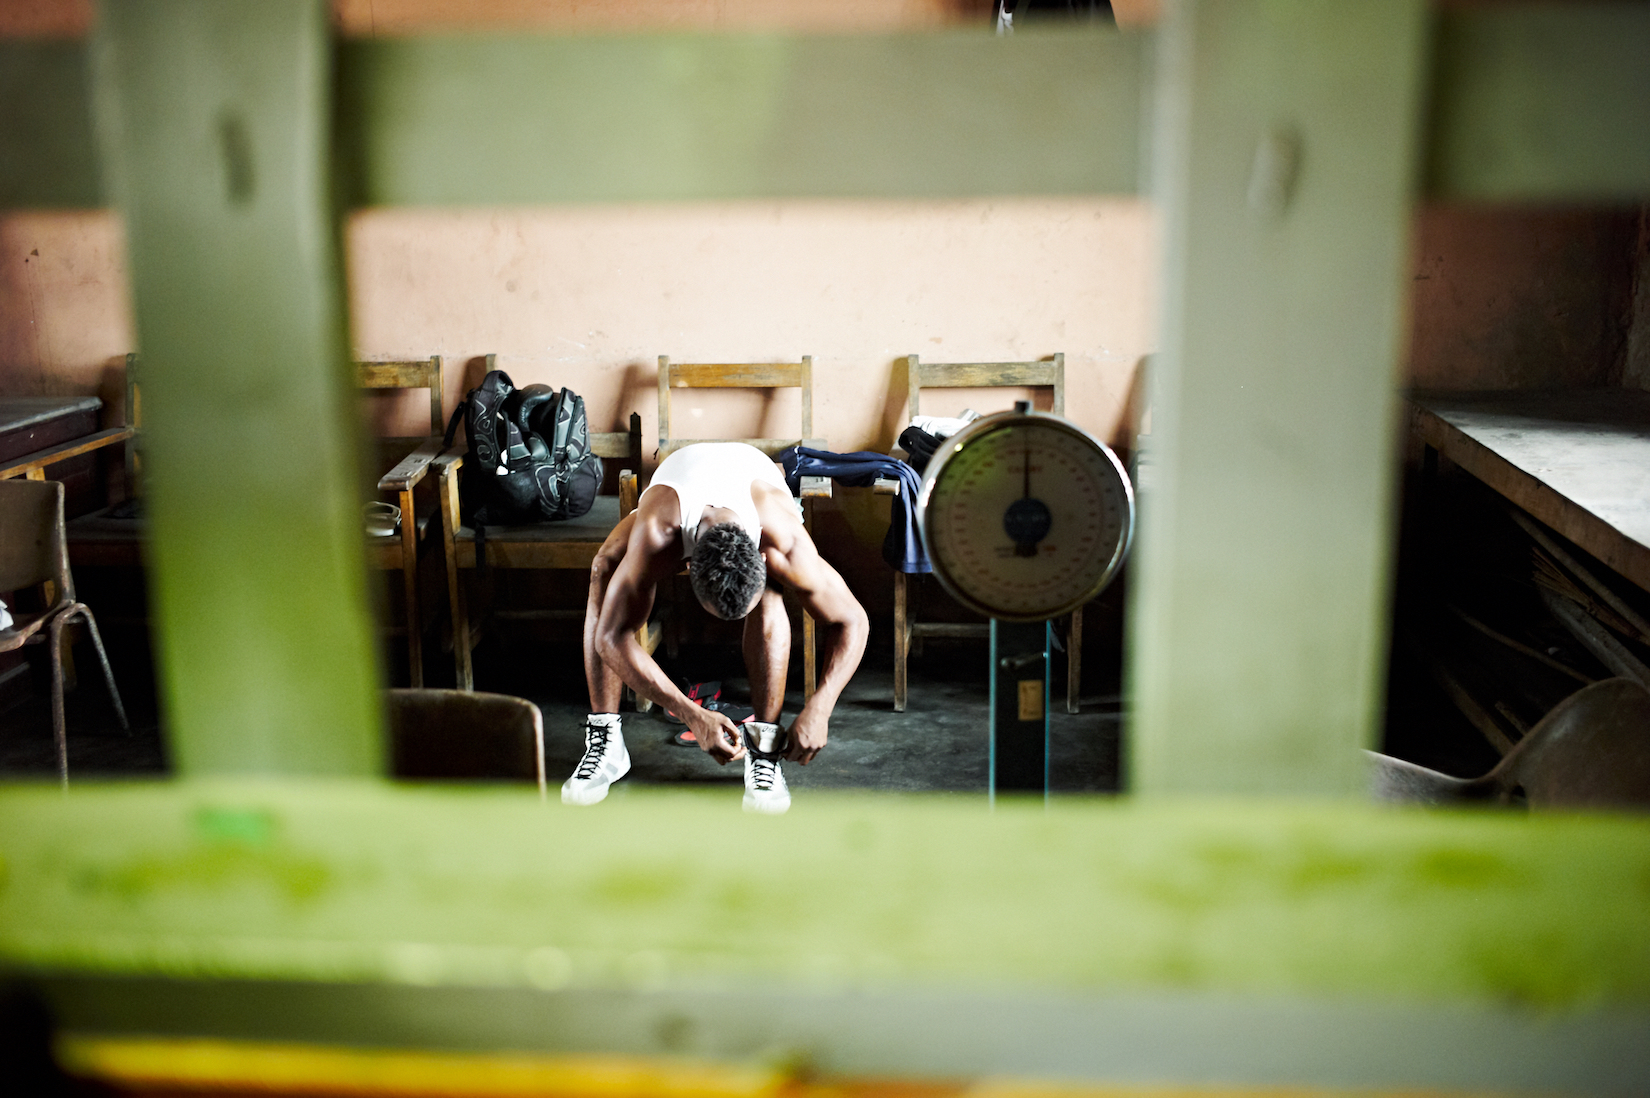 photography_boxersinghana_andreasjakwerth_43